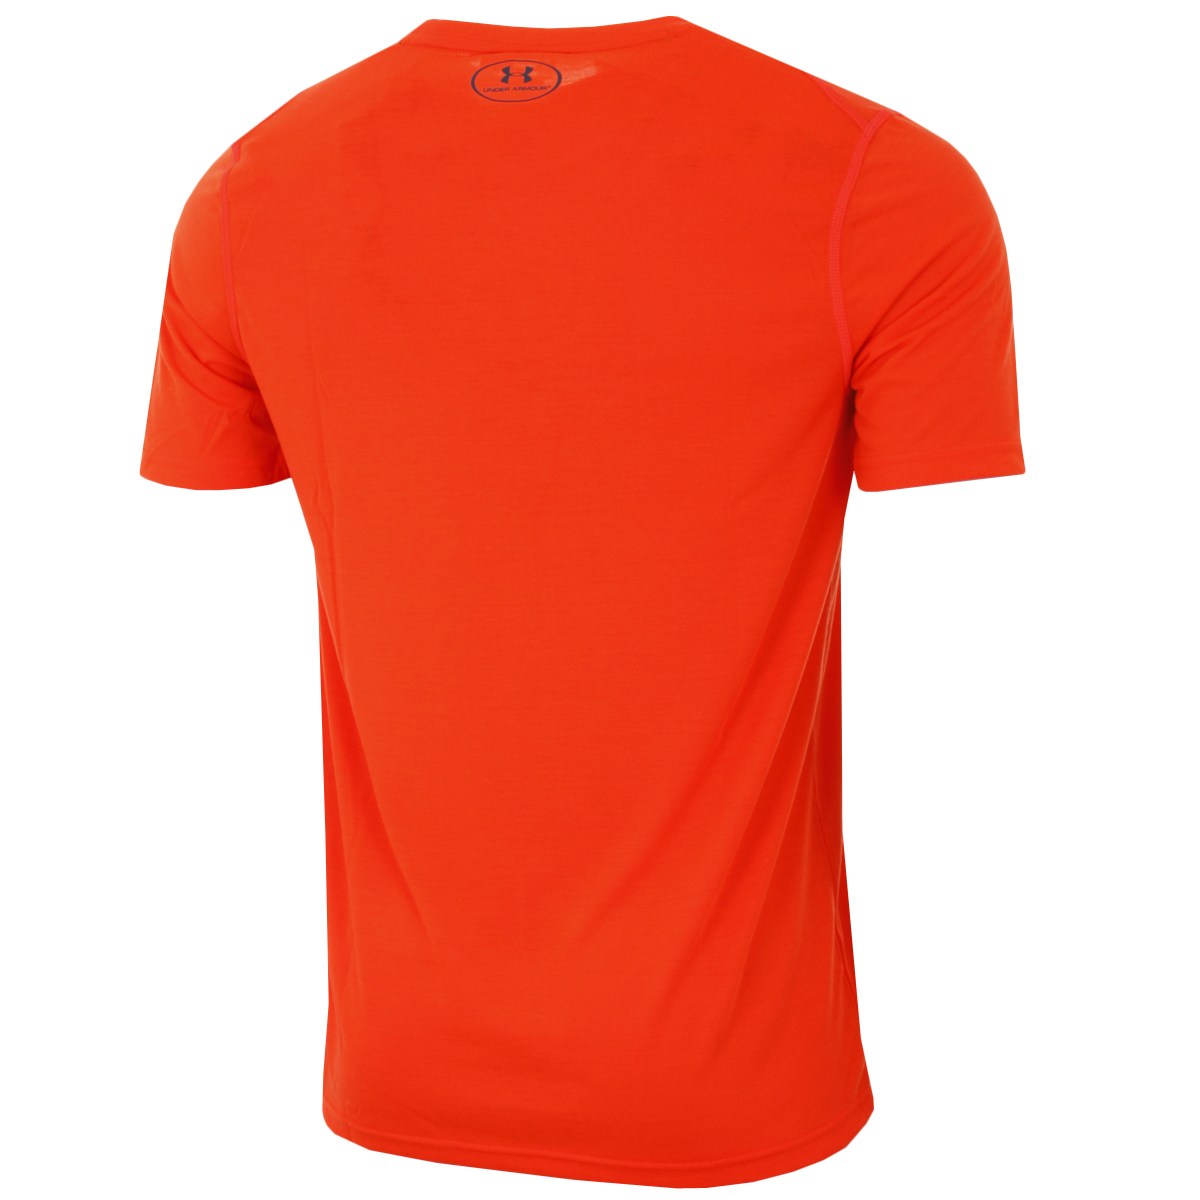 Under-Armour-Mens-UA-Threadborne-Fitted-Short-Sleeve-Gym-Tee-Sport-T-Shirt thumbnail 28